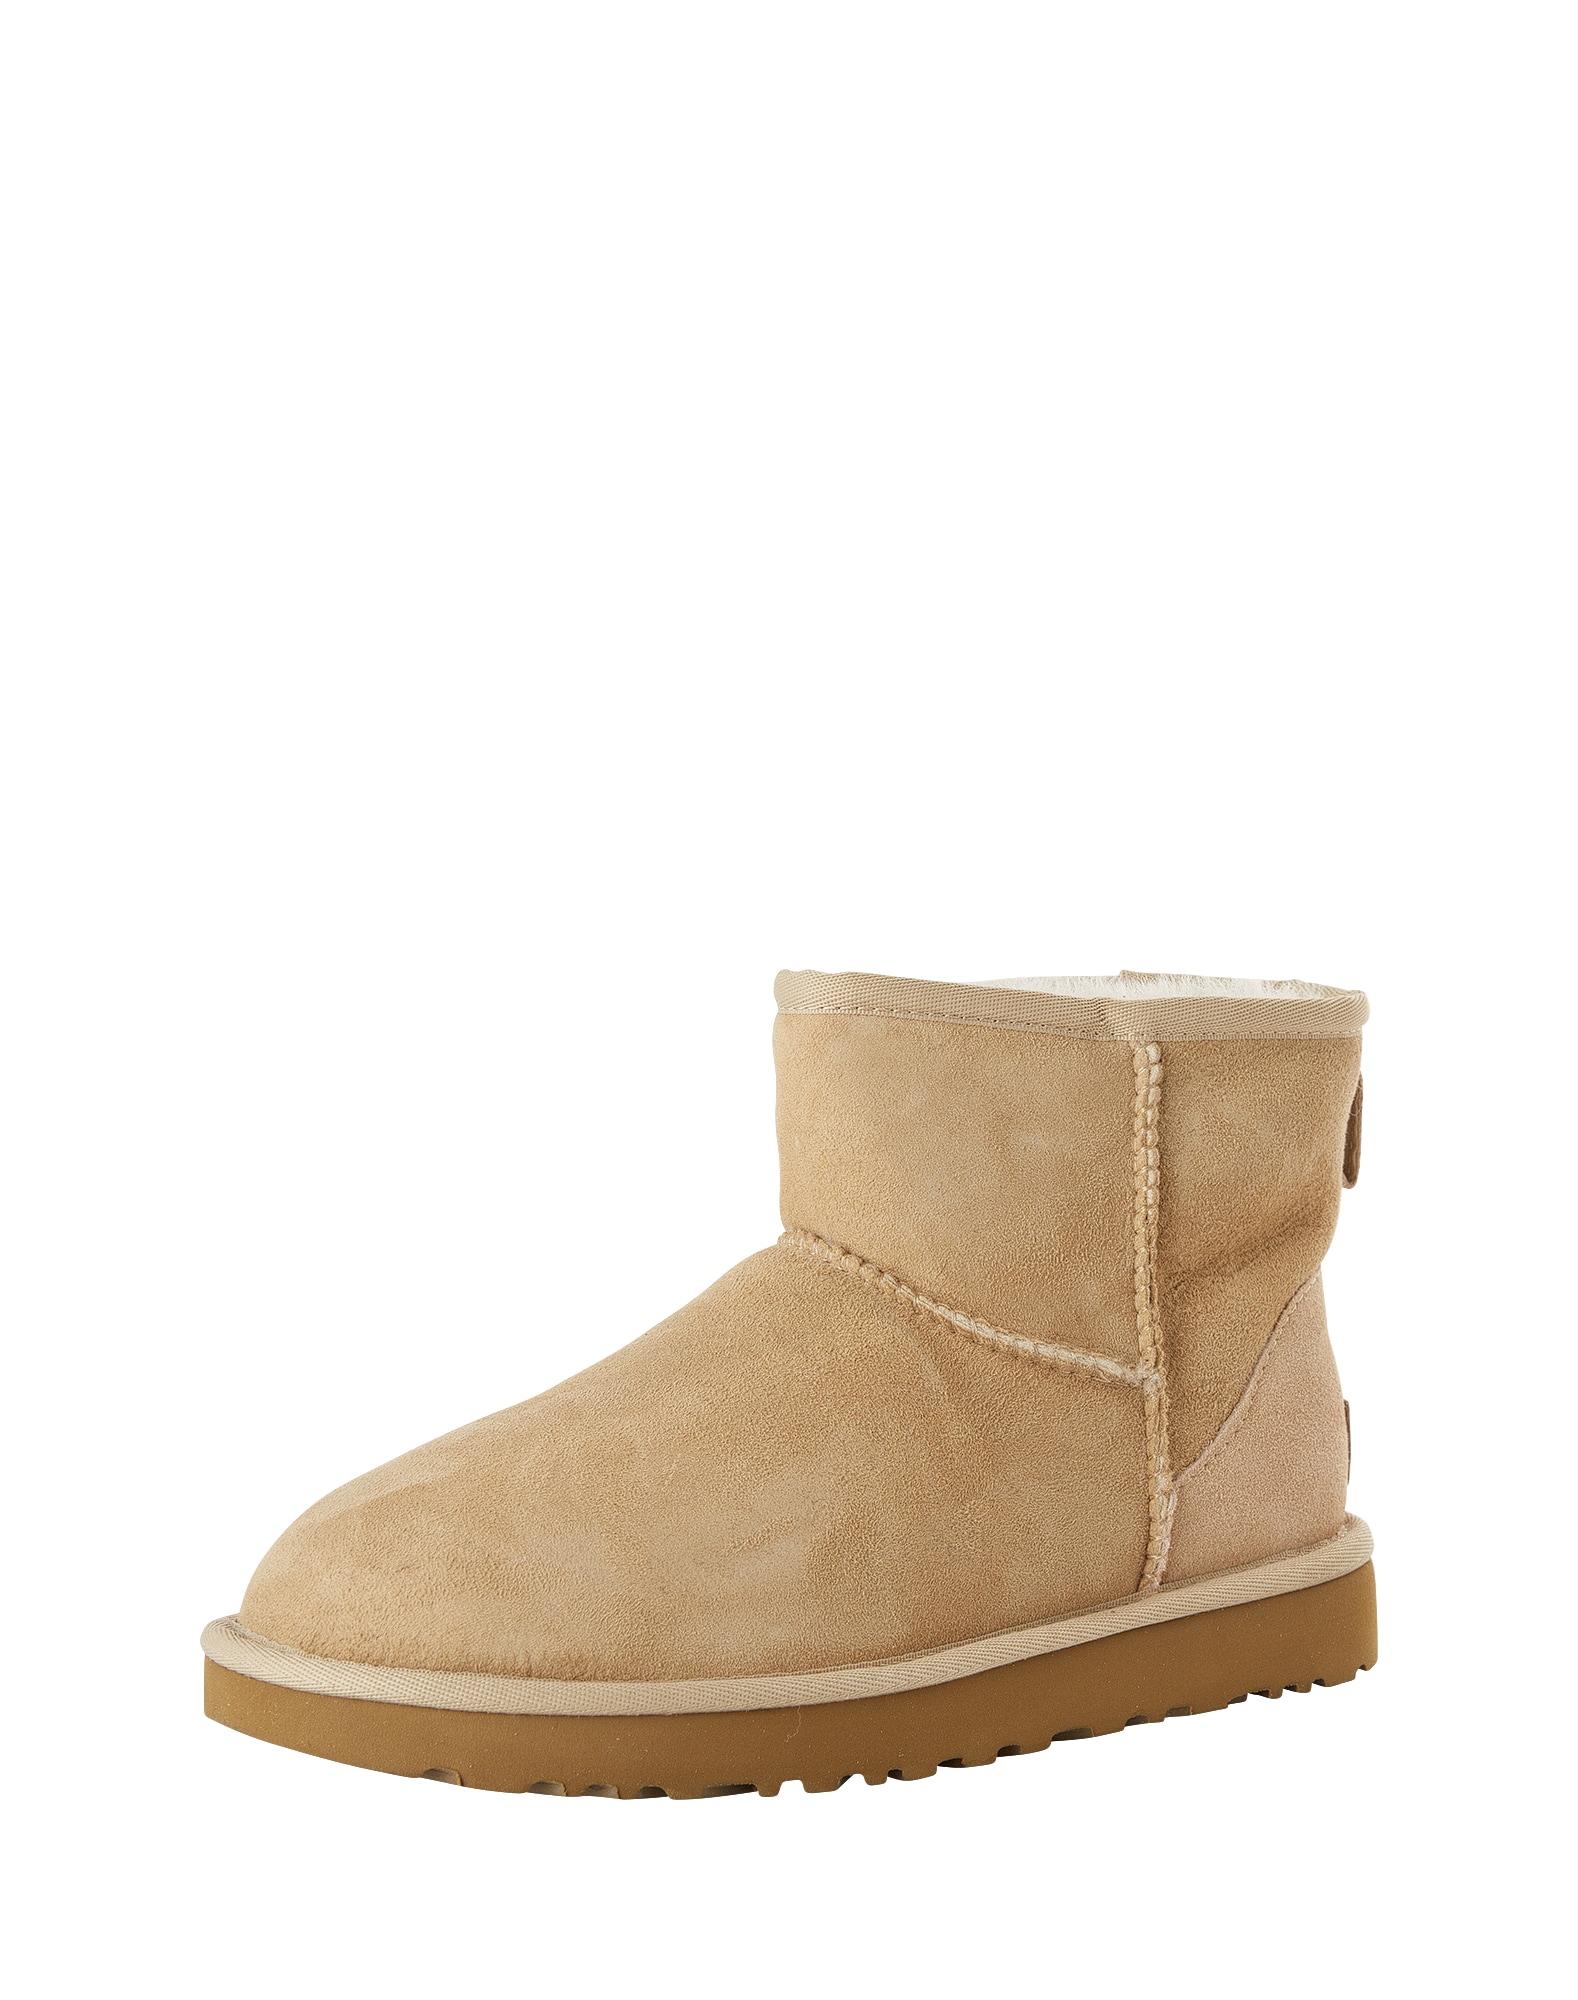 UGG, Dames Snowboots 'Classic Mini II', sand / bruin